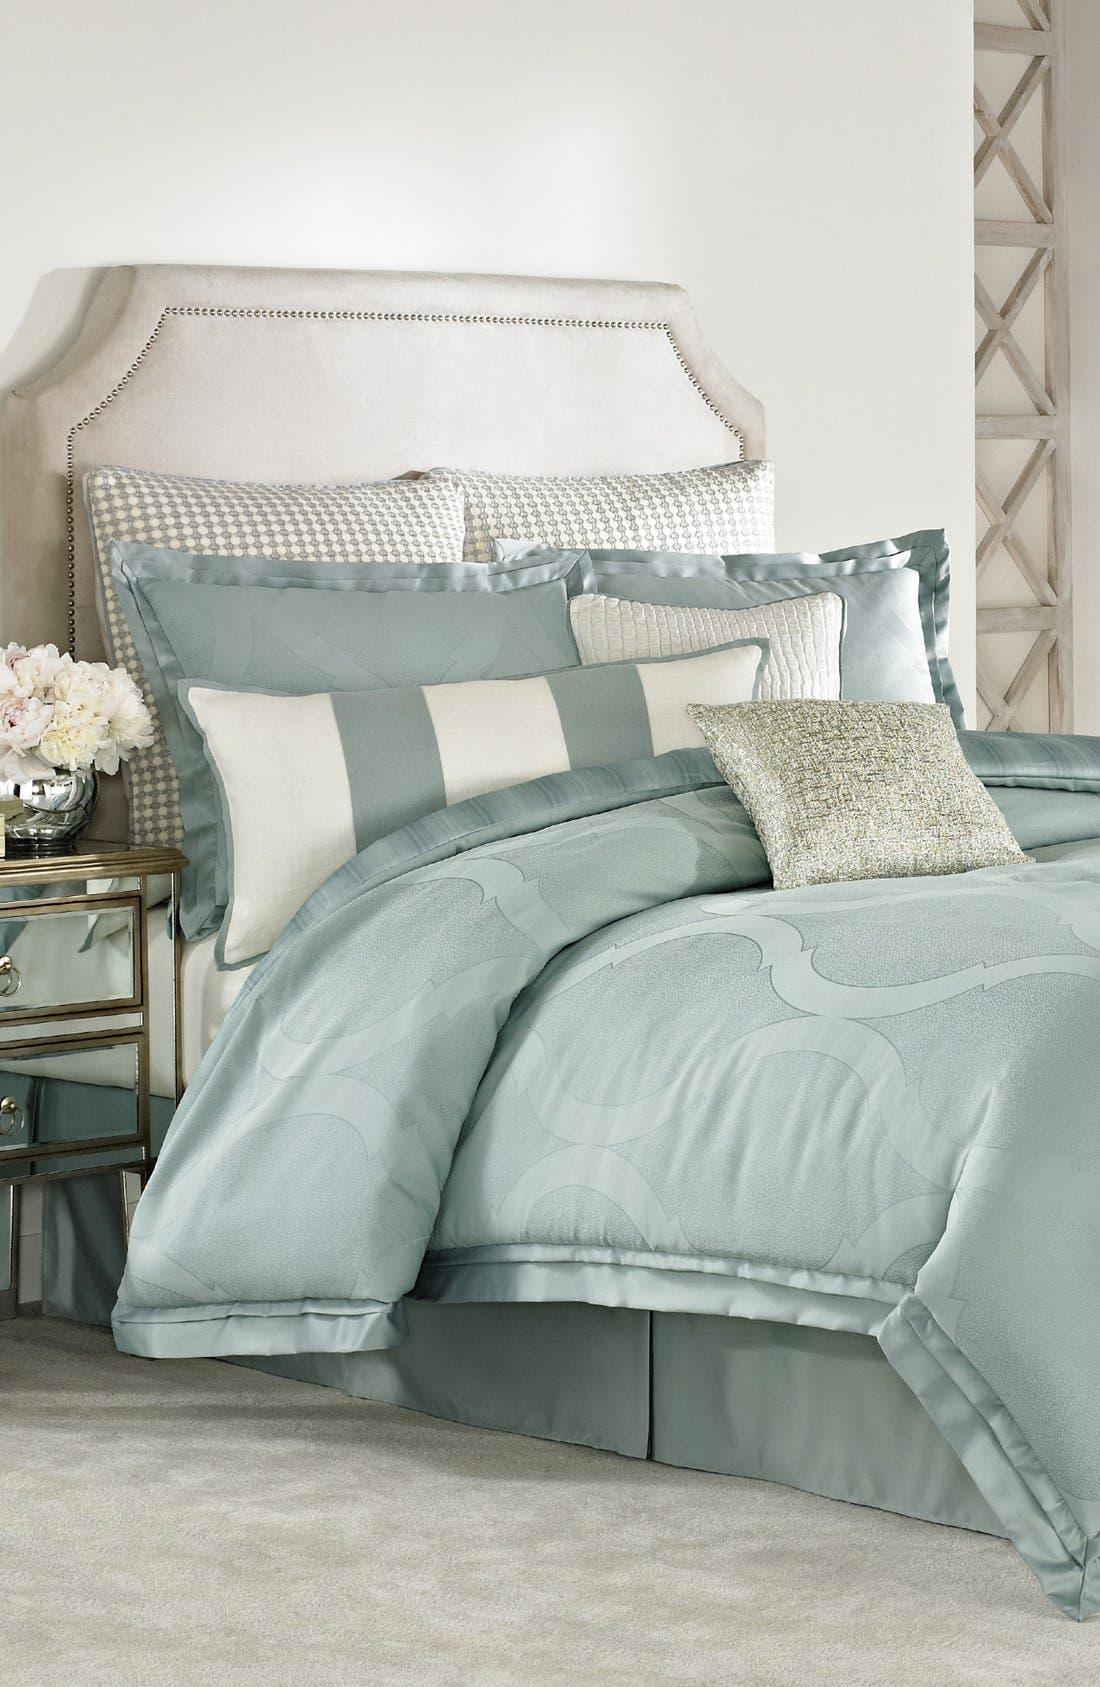 Alternate Image 1 Selected - Vince Camuto 'Bal Harbour' Comforter Set